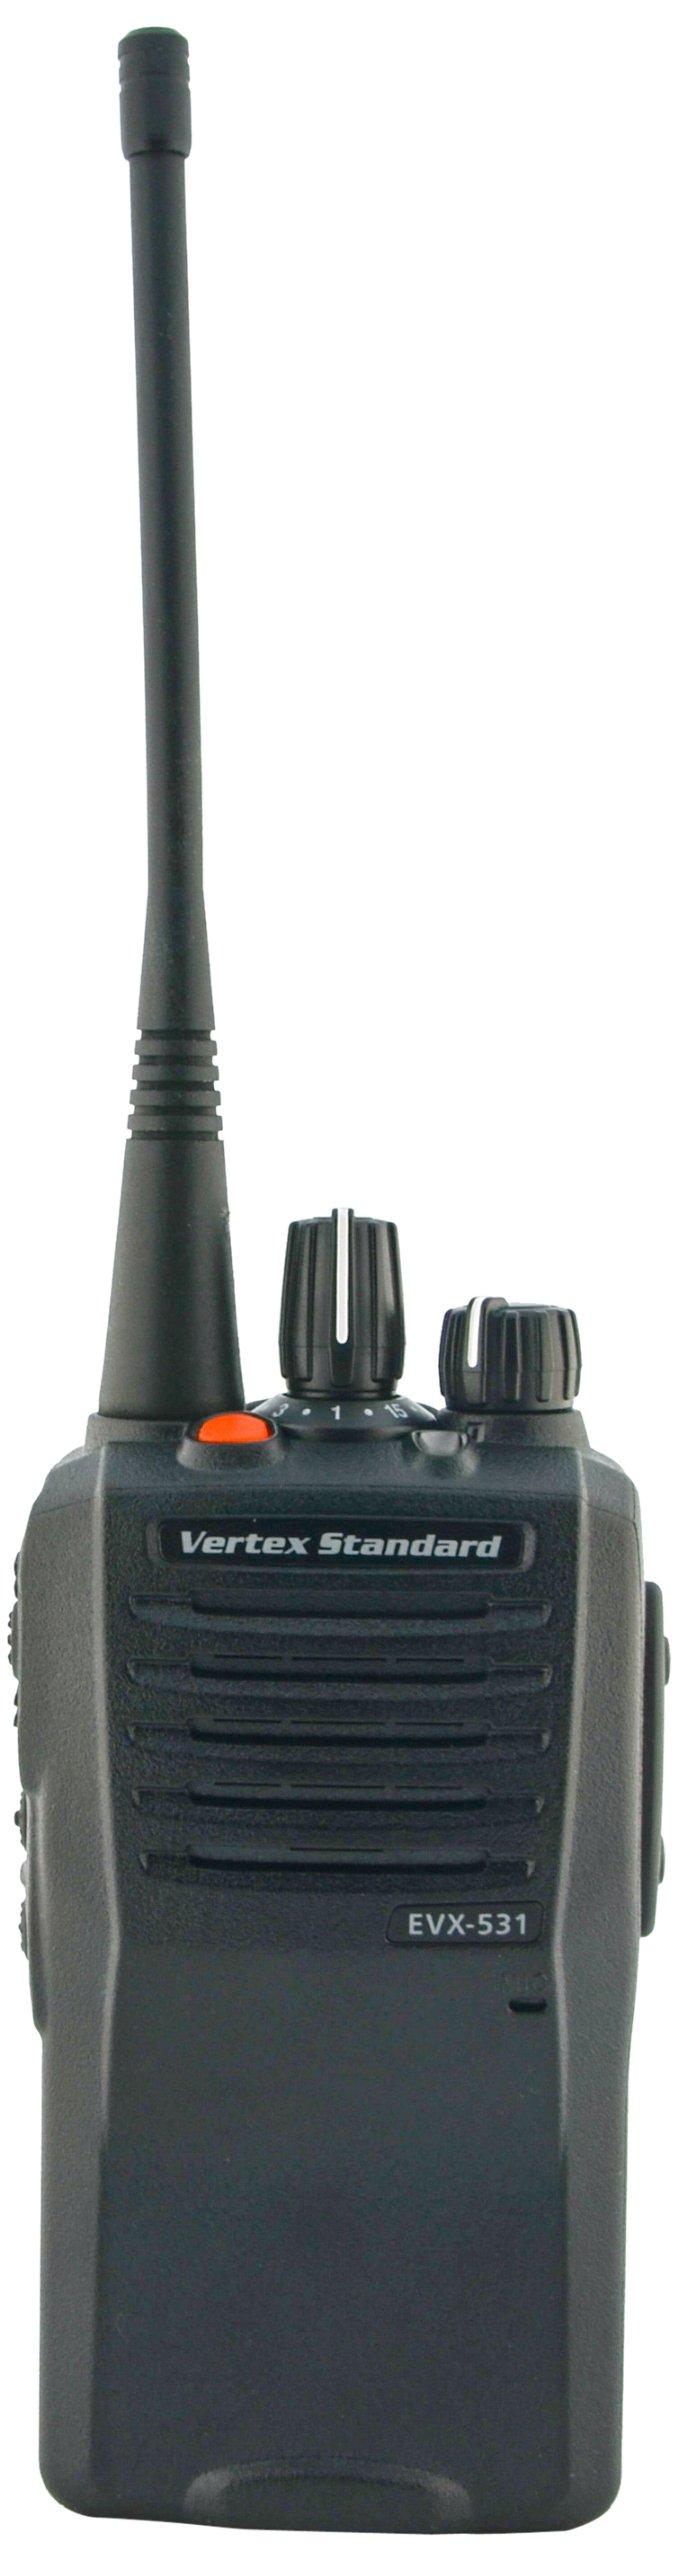 Vertex EVX531-G7UNEP Business/Industrial DMR Digital/Analog Portable UHF Universal Radio Package (Black)